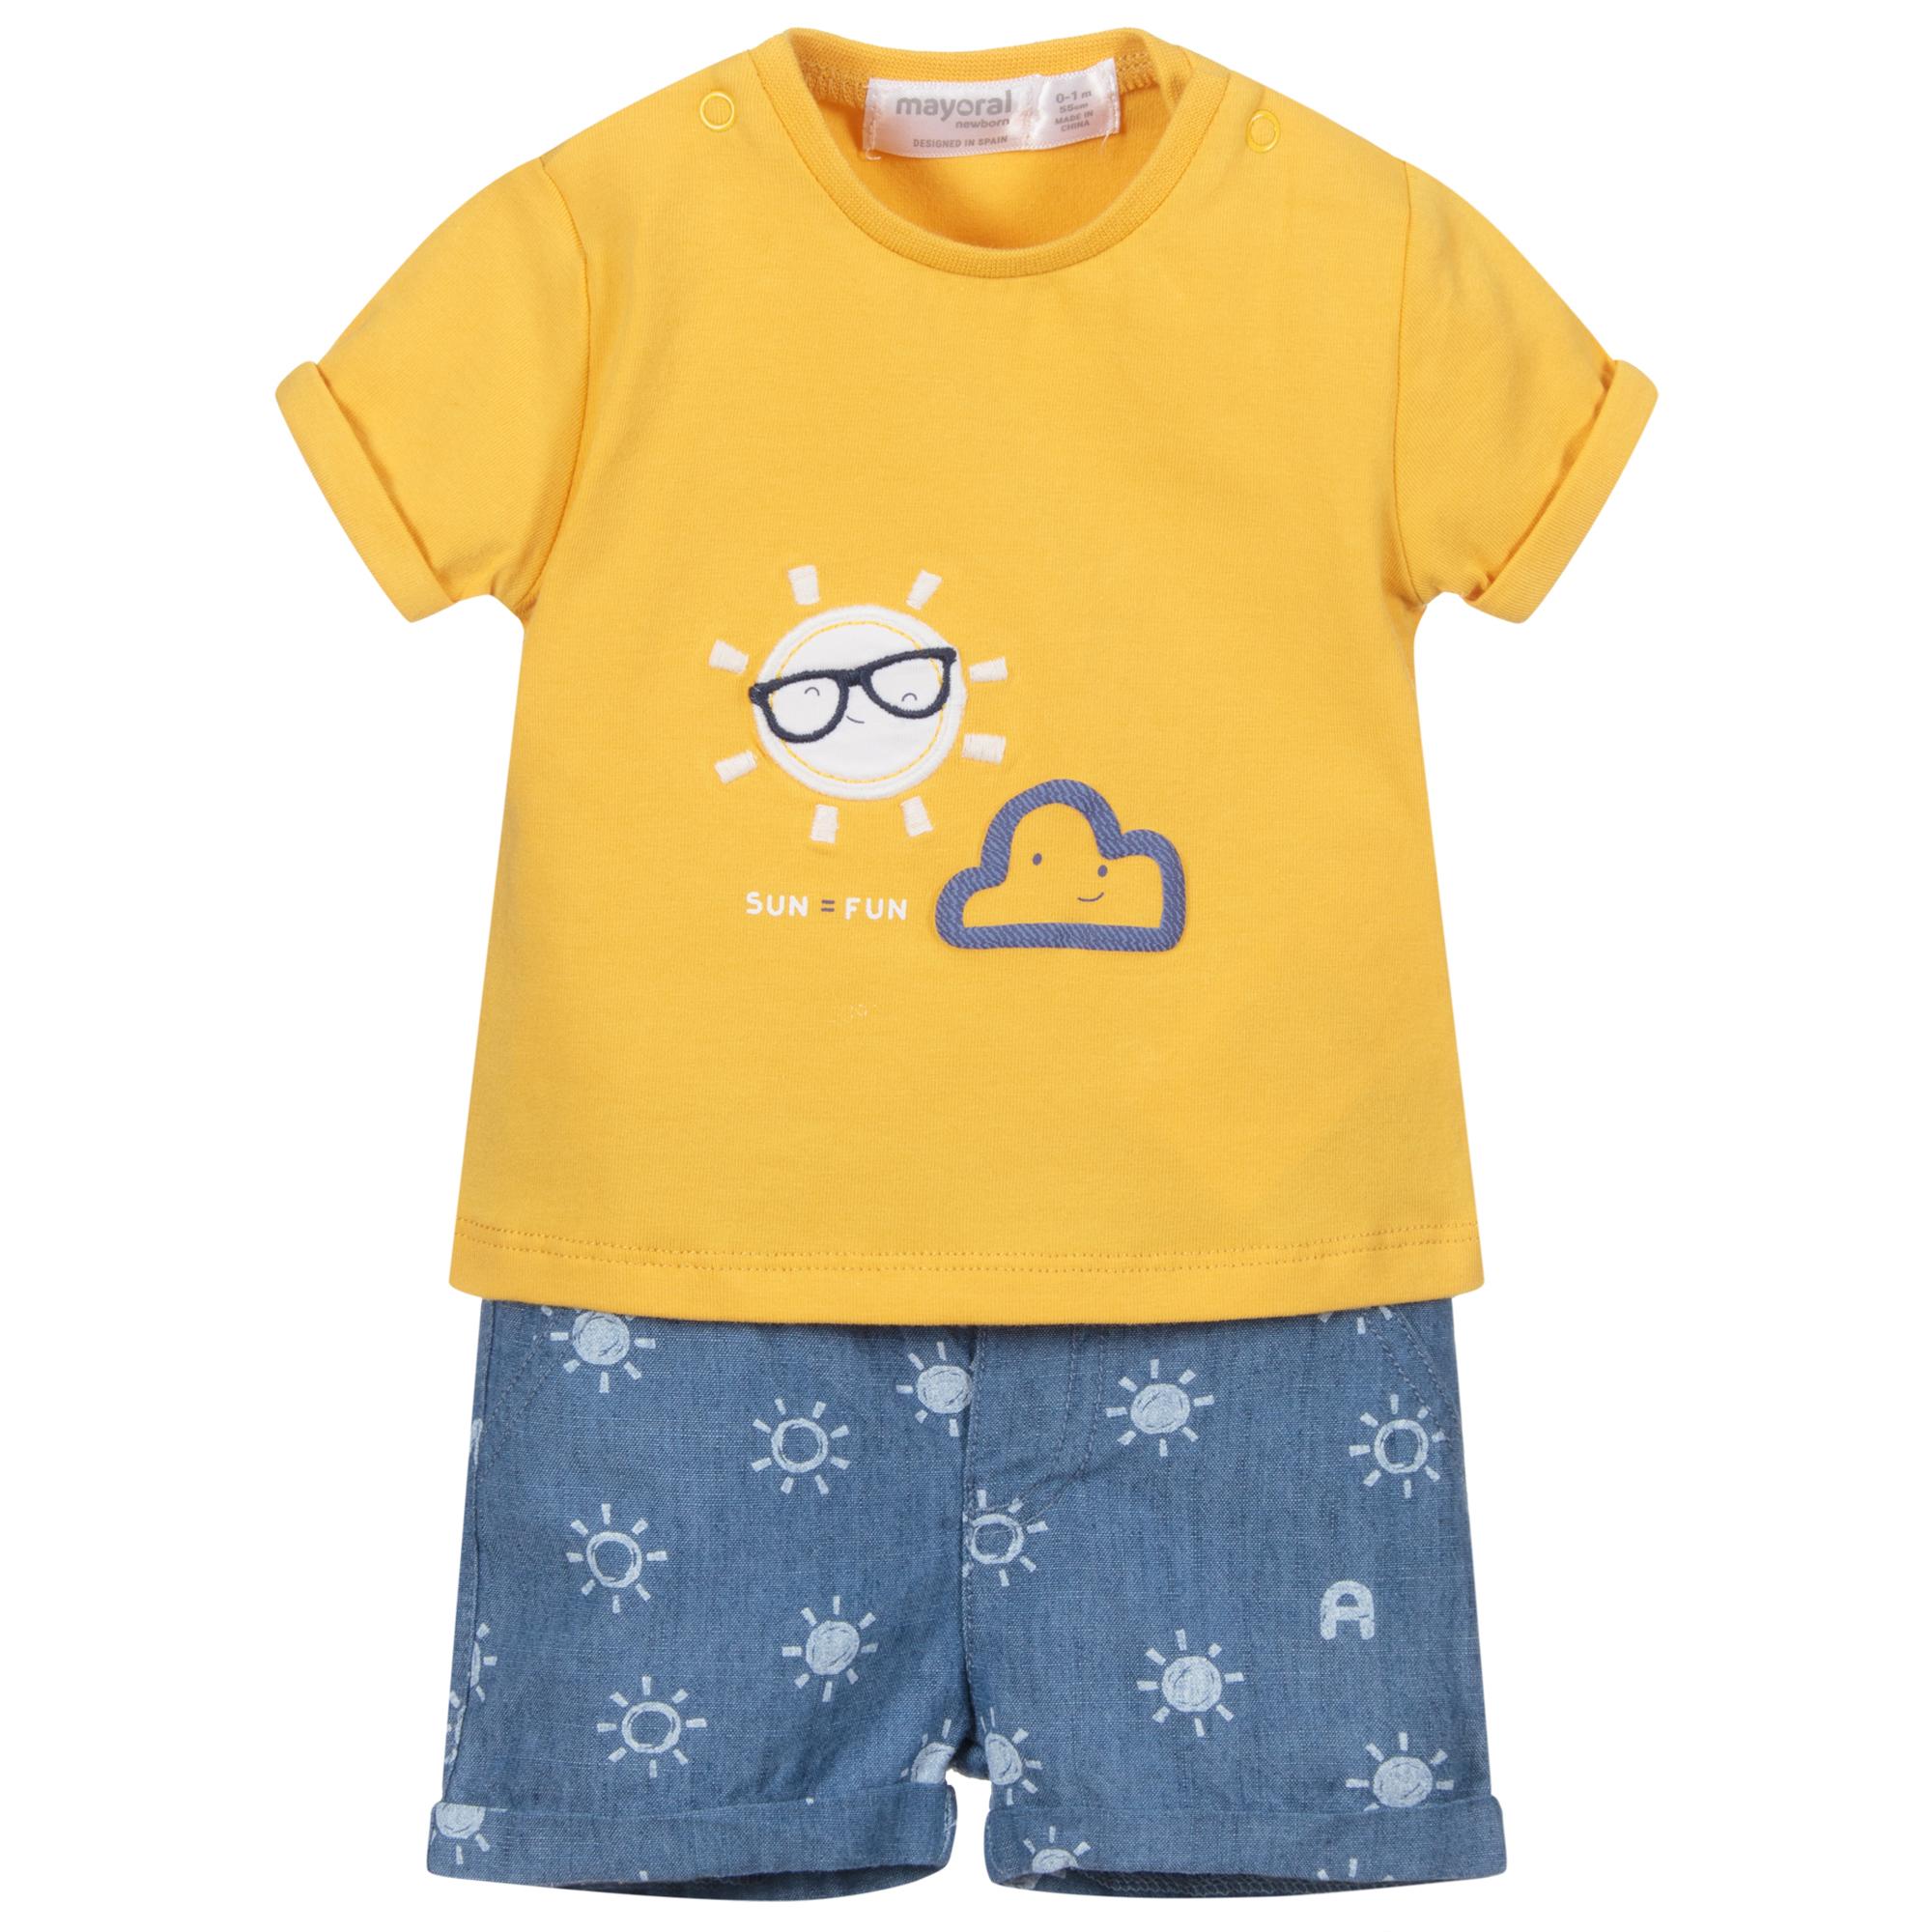 Spanish Designer MAYORAL Baby Boy 2 Piece Set Shorts//T-Shirt Set WAS £38 NOW £20